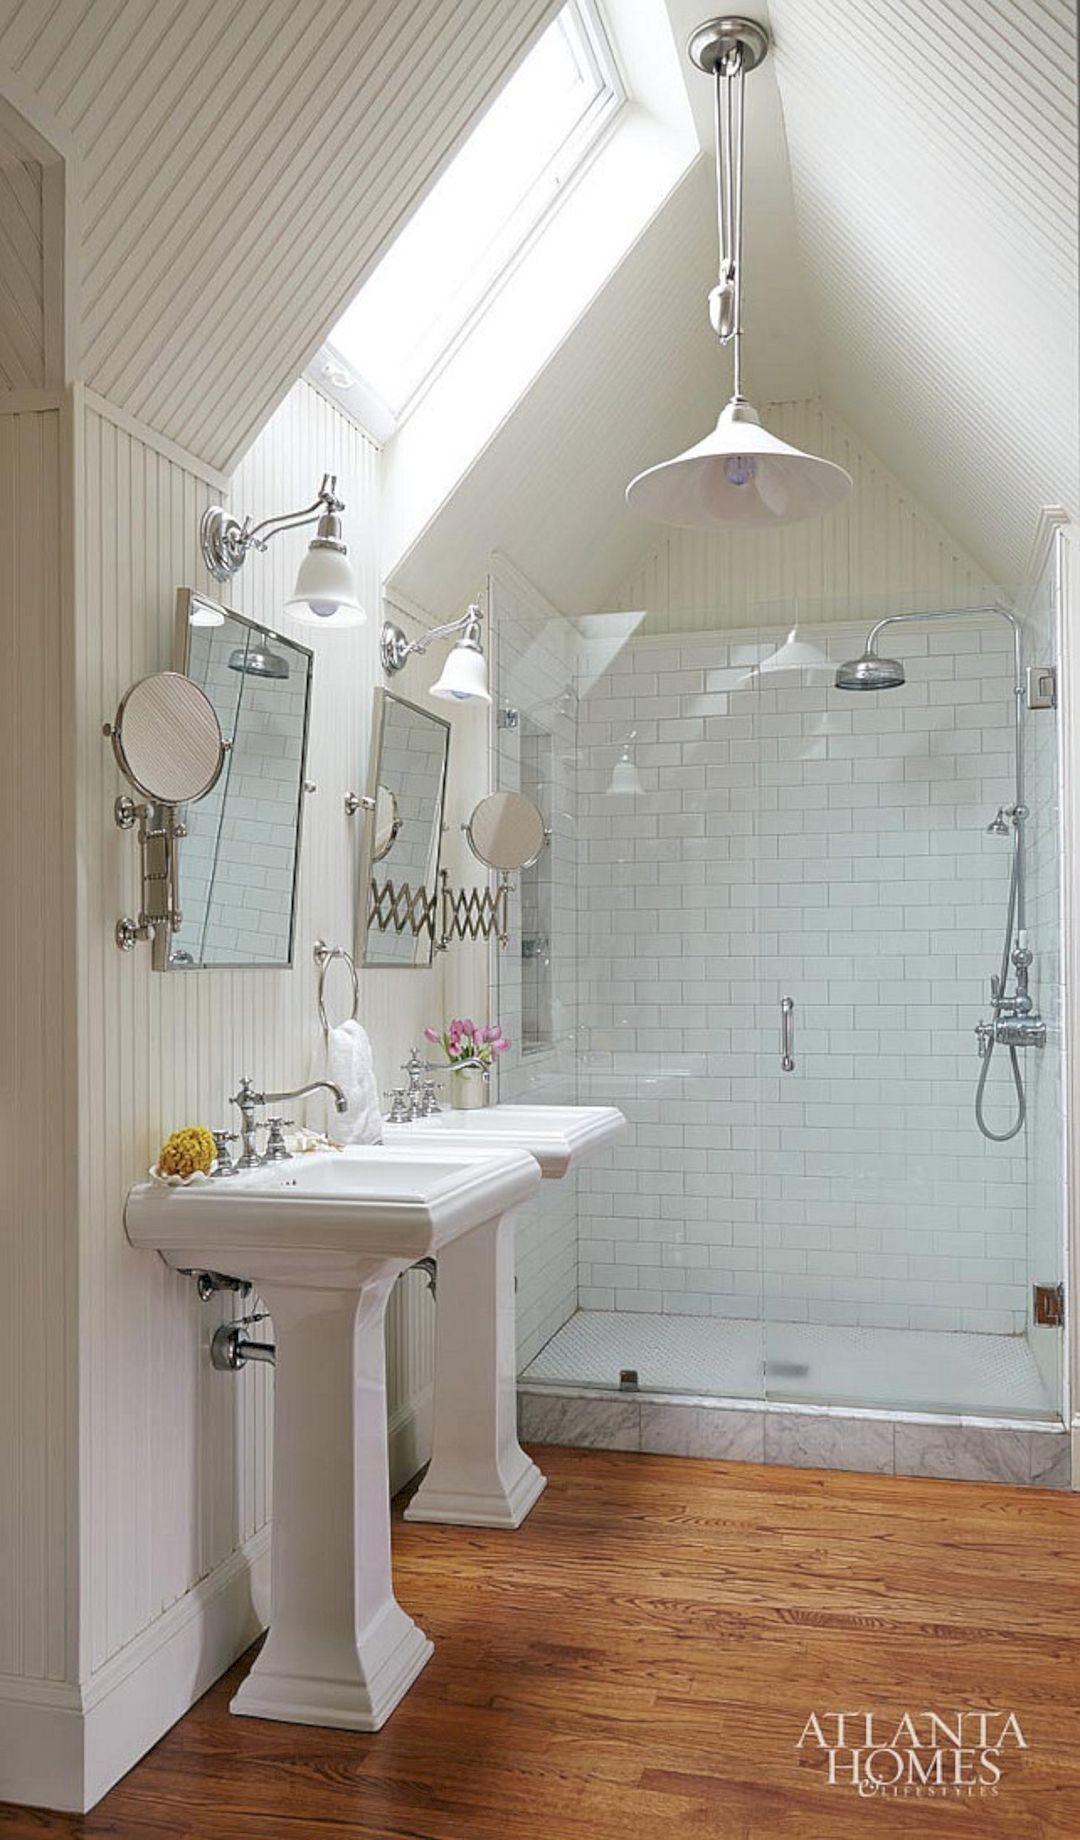 6 Farmhouse Rooms That Deserve A Beadboard Ceiling Bathroom Design Attic Bathroom Bathrooms Remodel